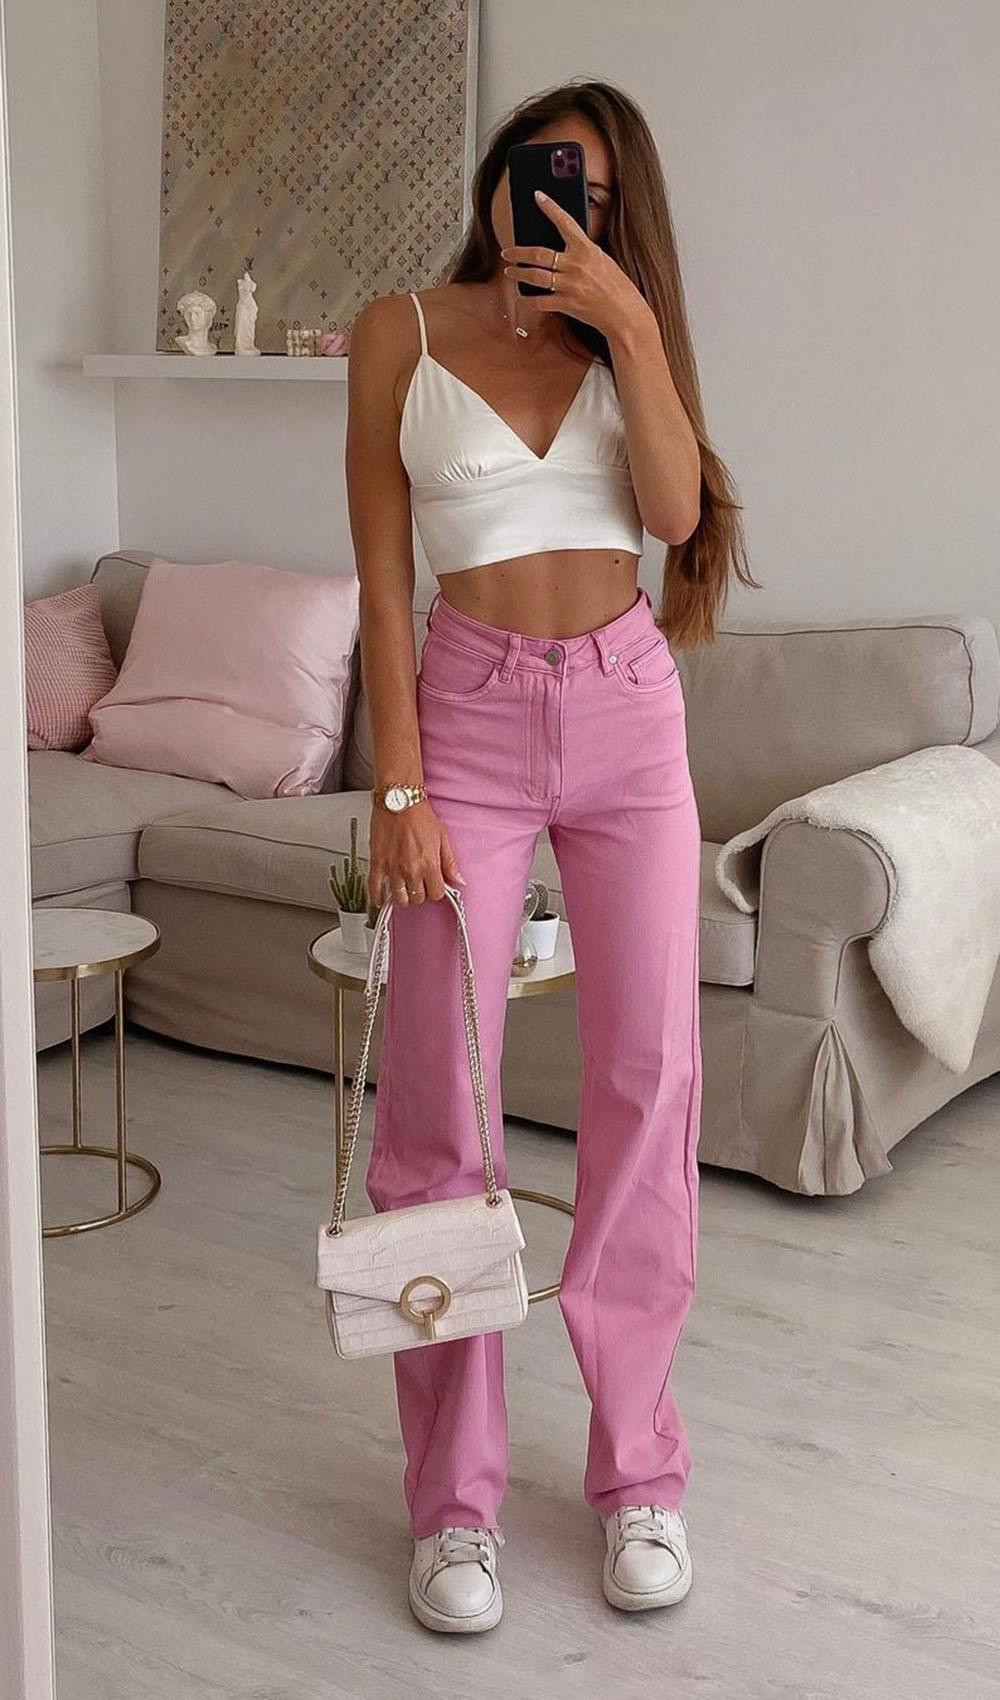 calça rosa, top branco, blolsa e tênis branco